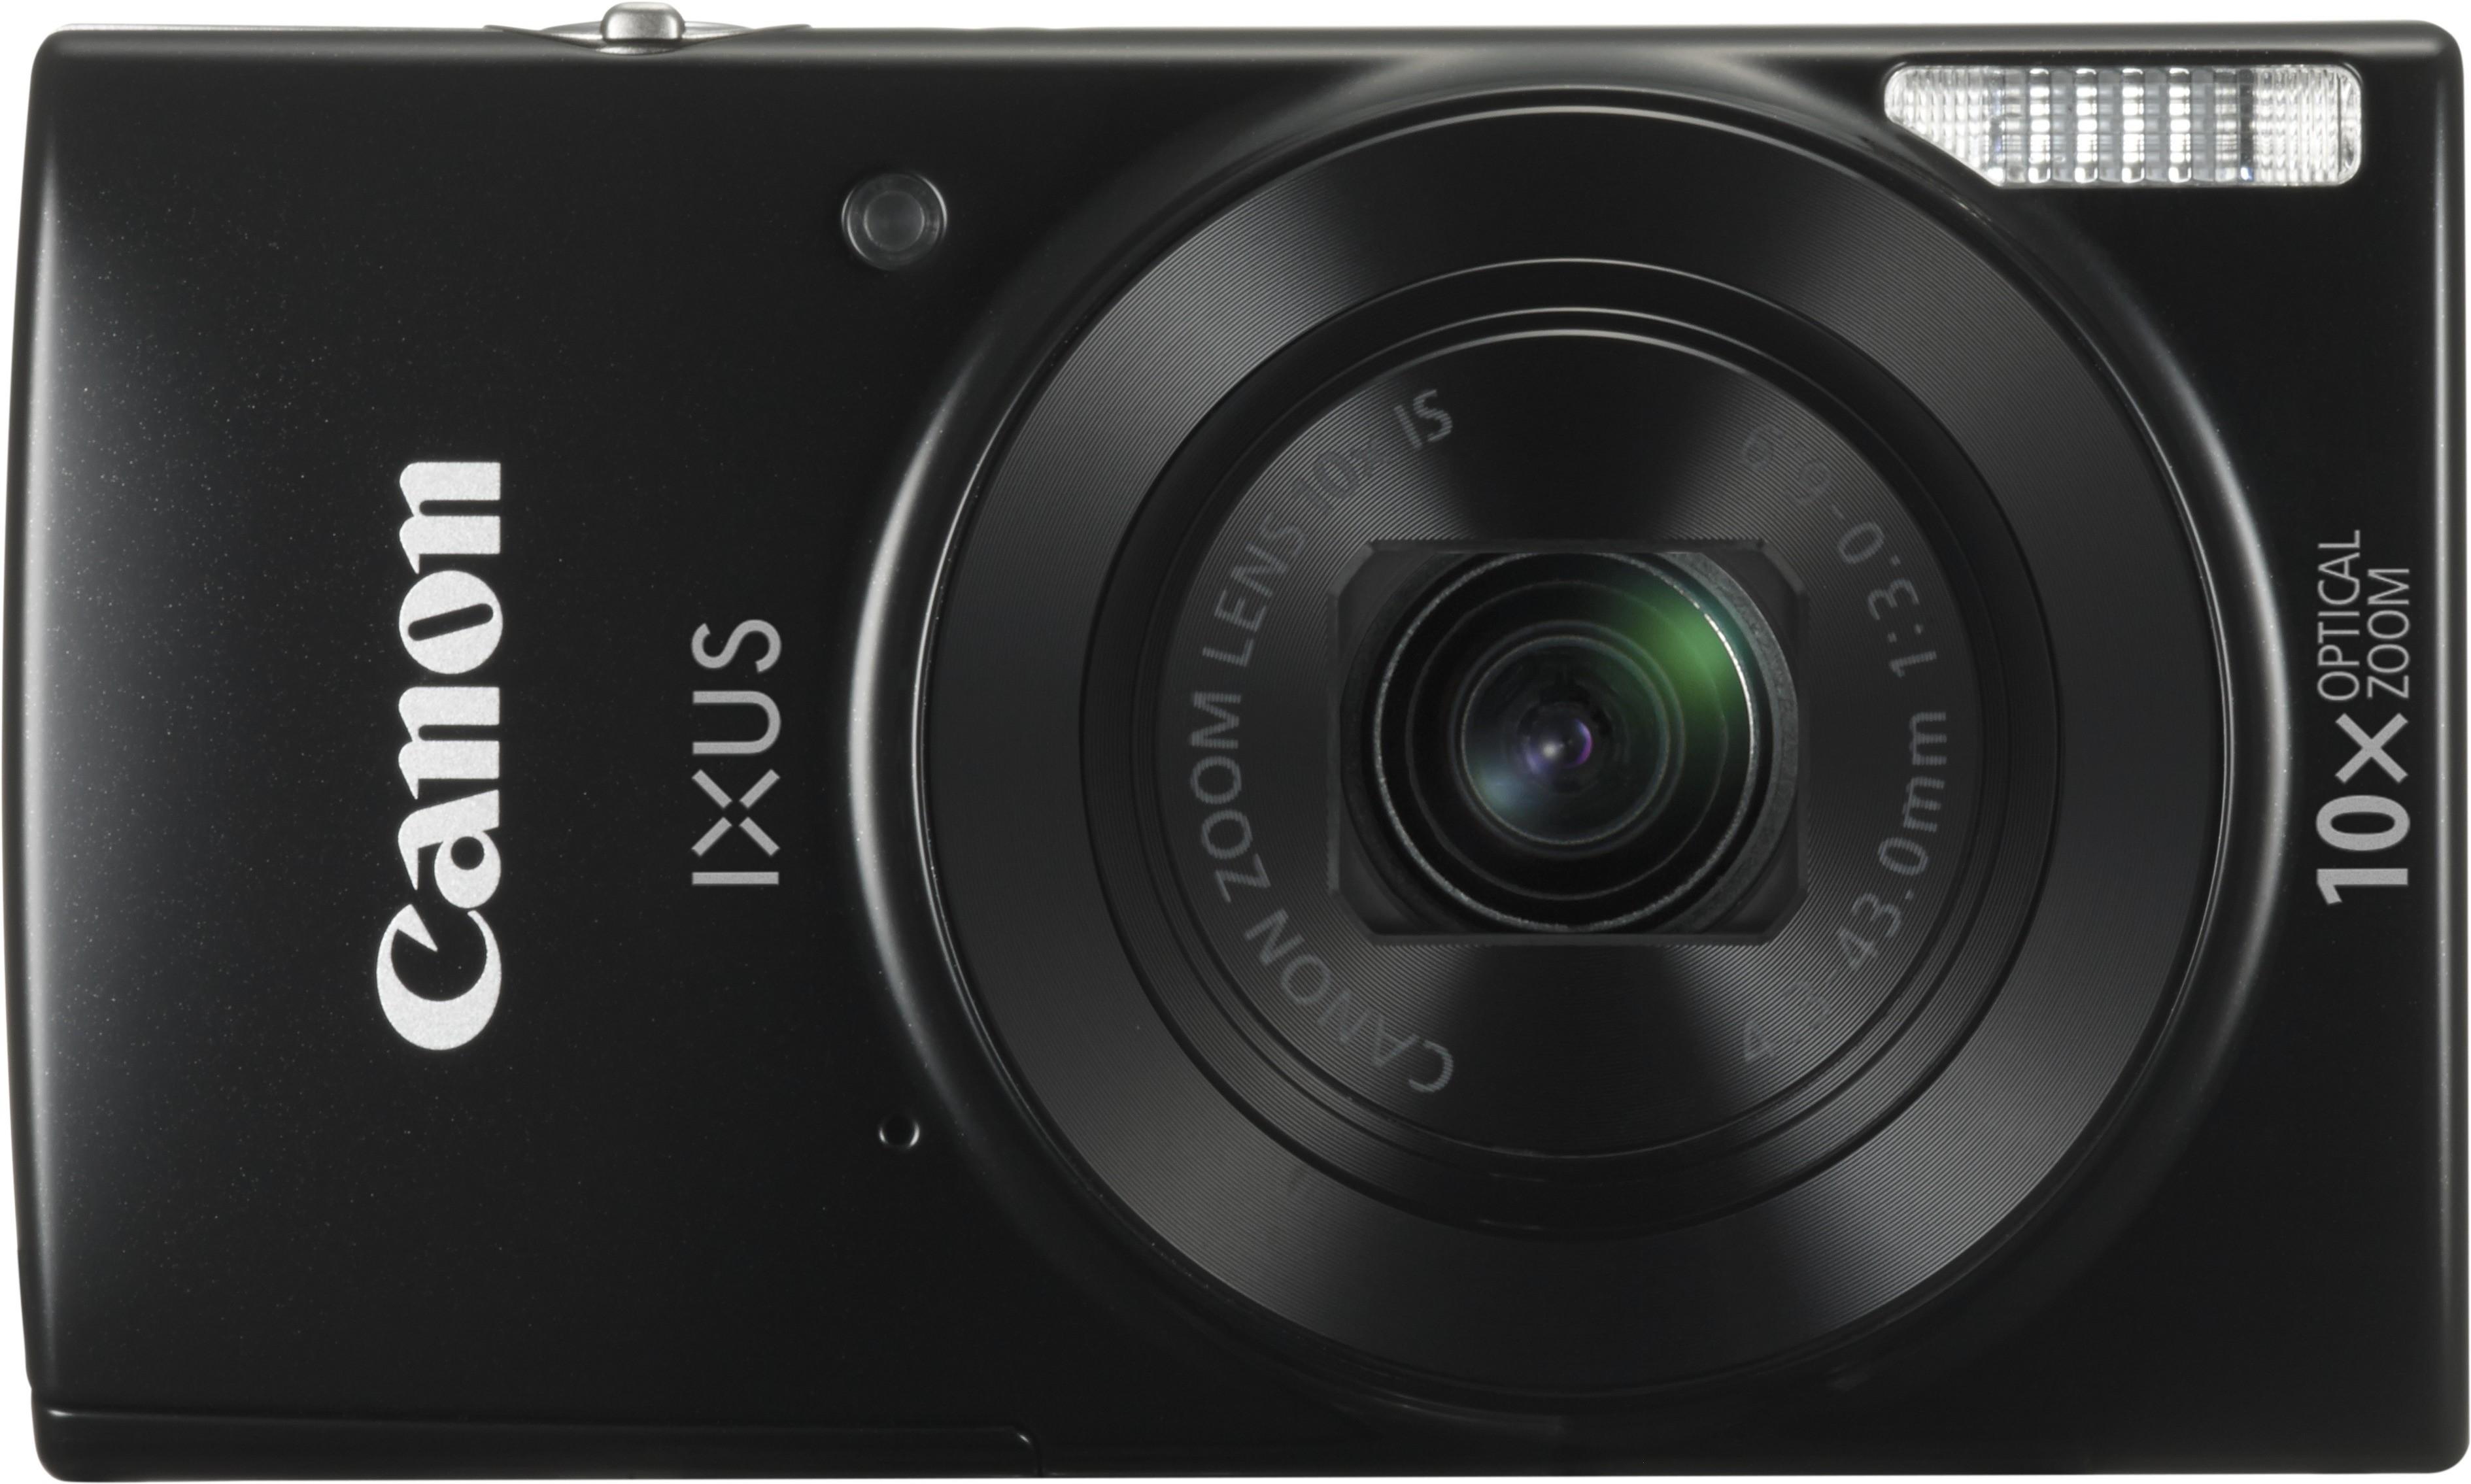 Deals - Gwalior - Canon IXUS 180 <br> Point & Shoot Camera<br> Category - cameras_and_accessories<br> Business - Flipkart.com